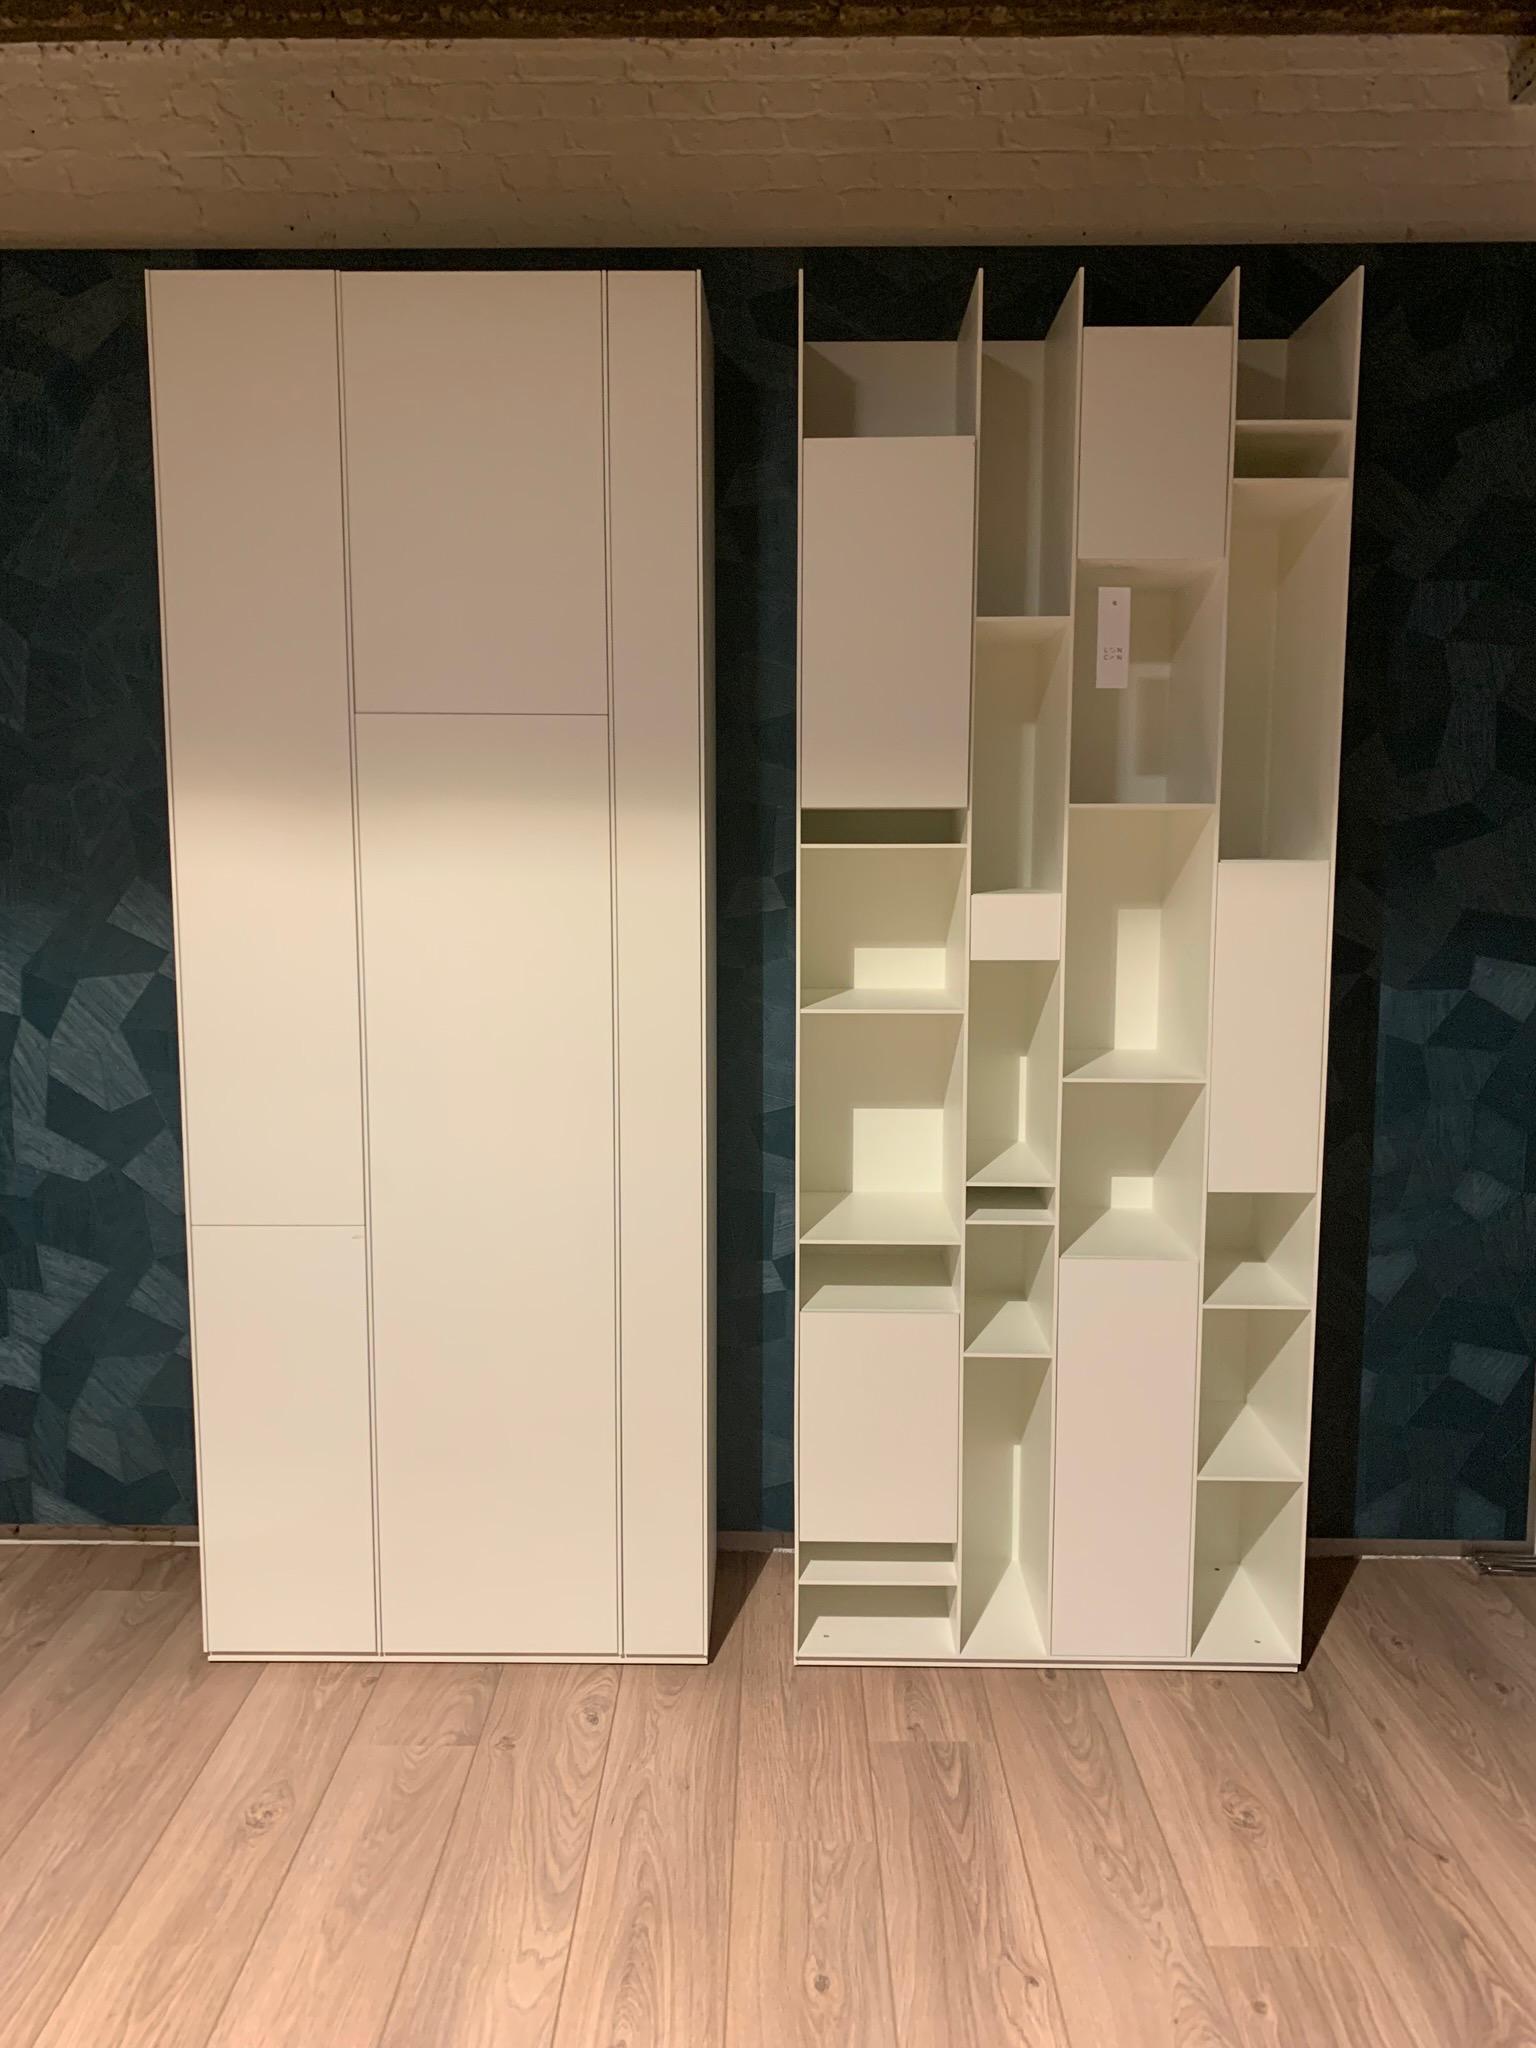 Mdf Italia Random Cabinet of Box — Solden Loncin